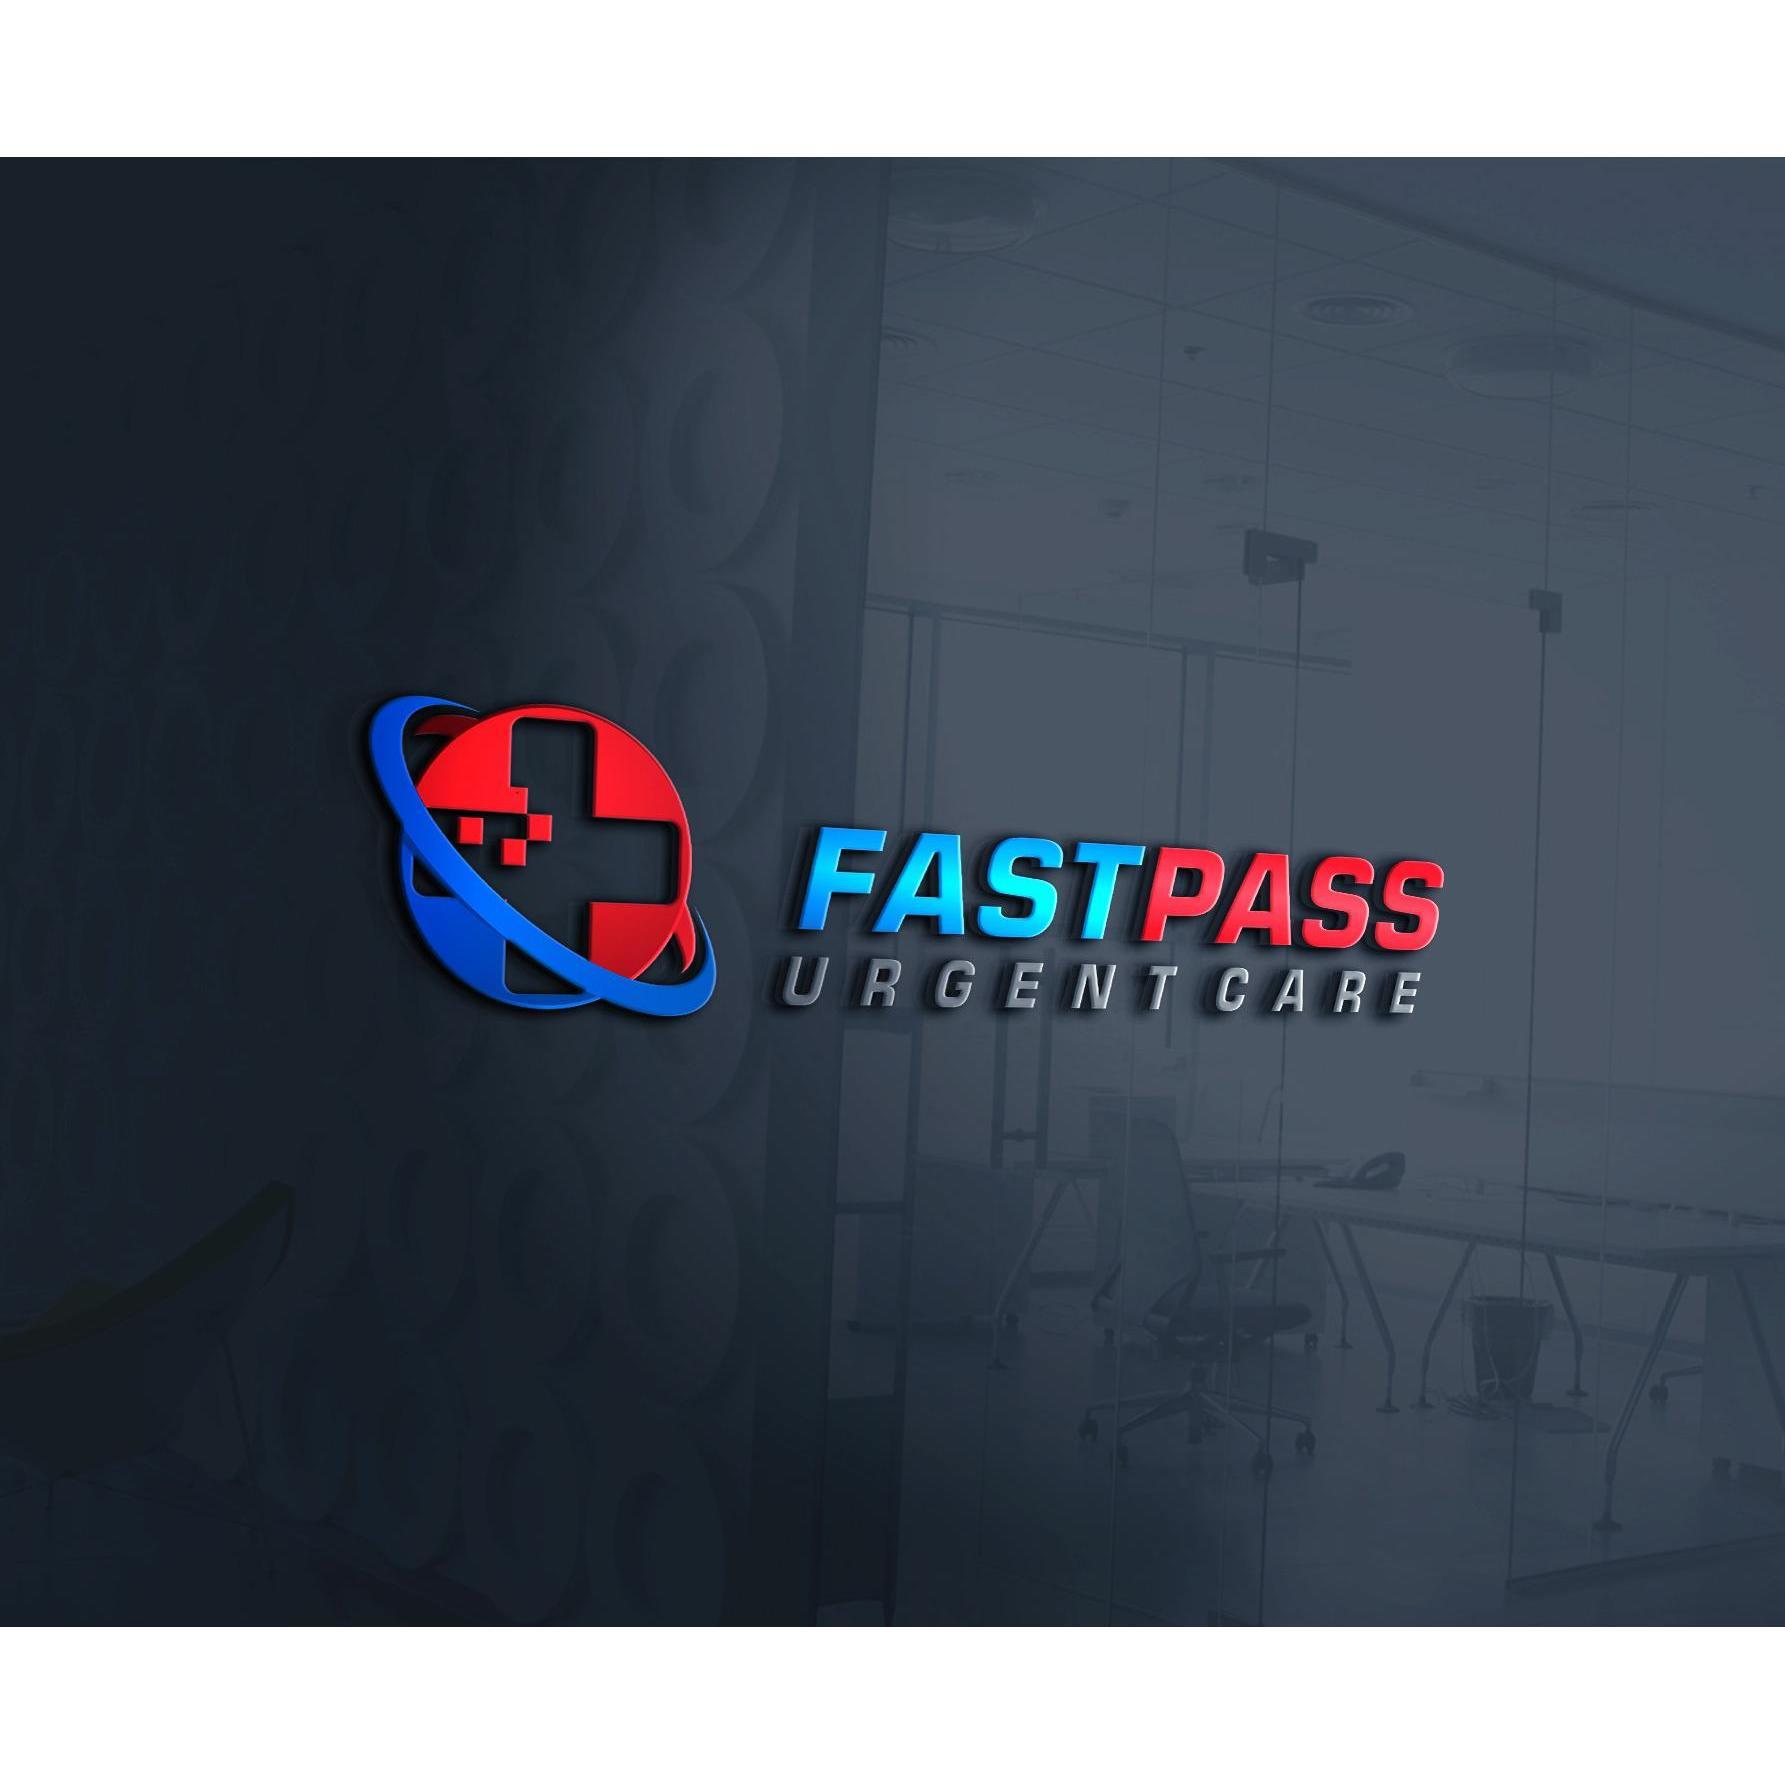 FastPass Urgent Care - Carrollton